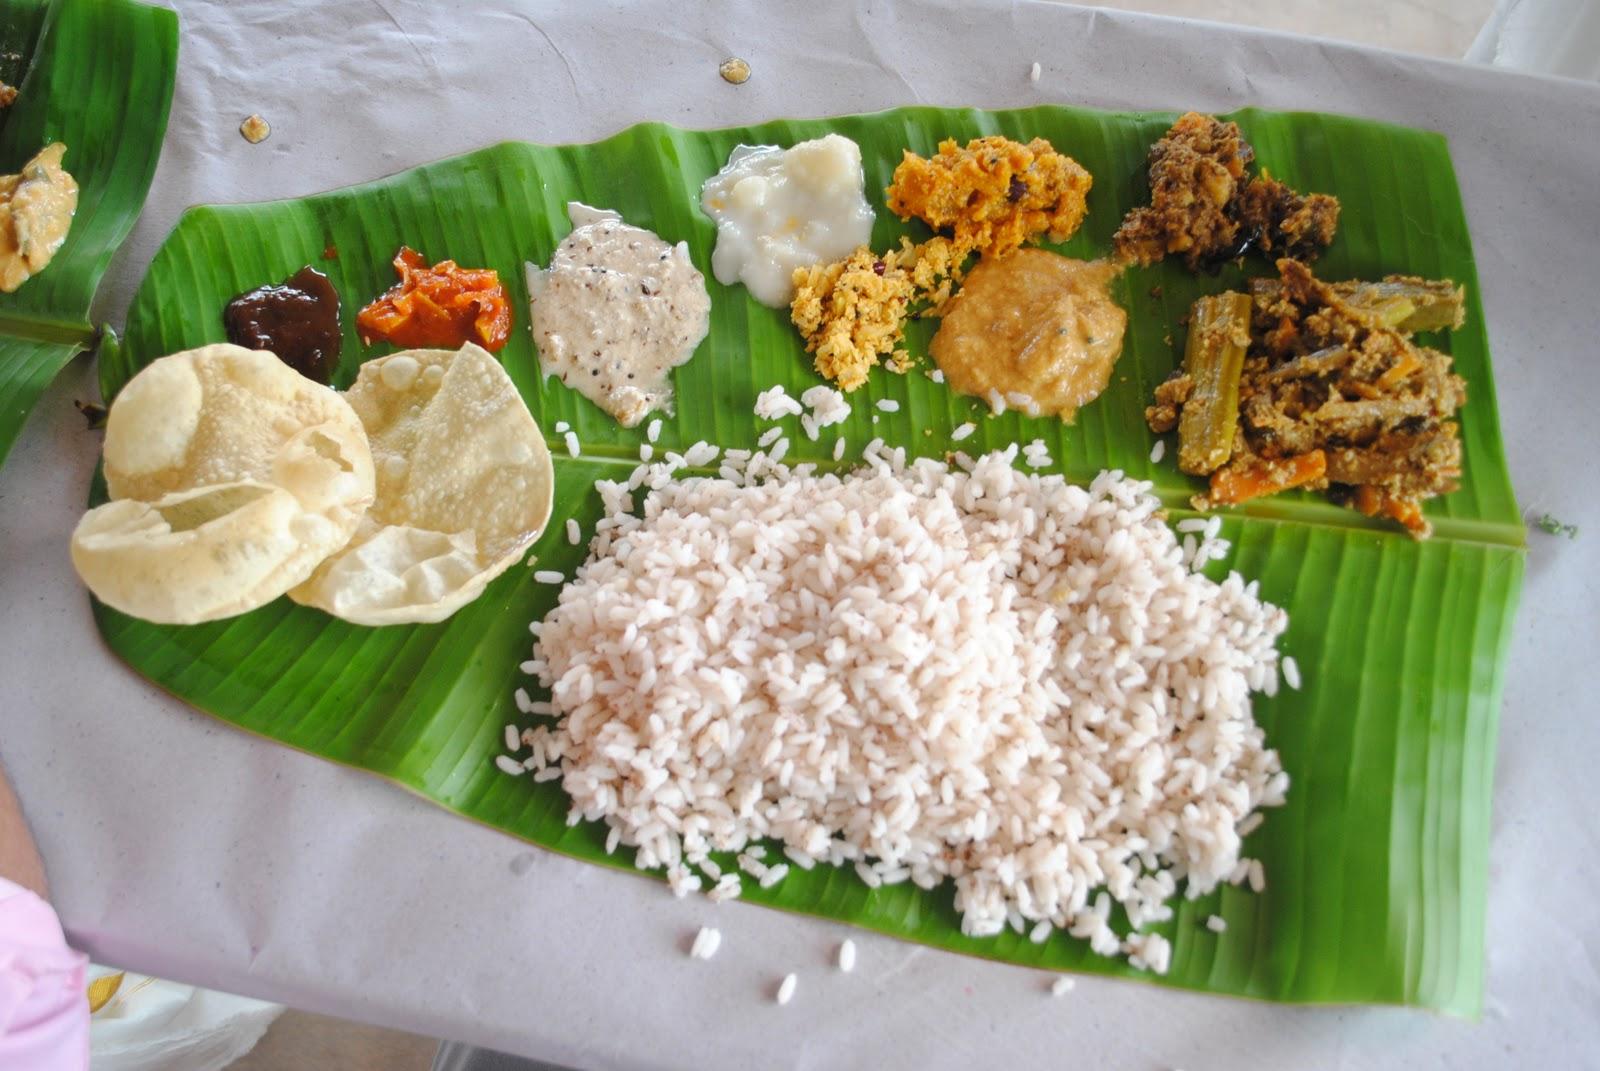 File:Kerala oonu.jpg - Wikimedia Commons